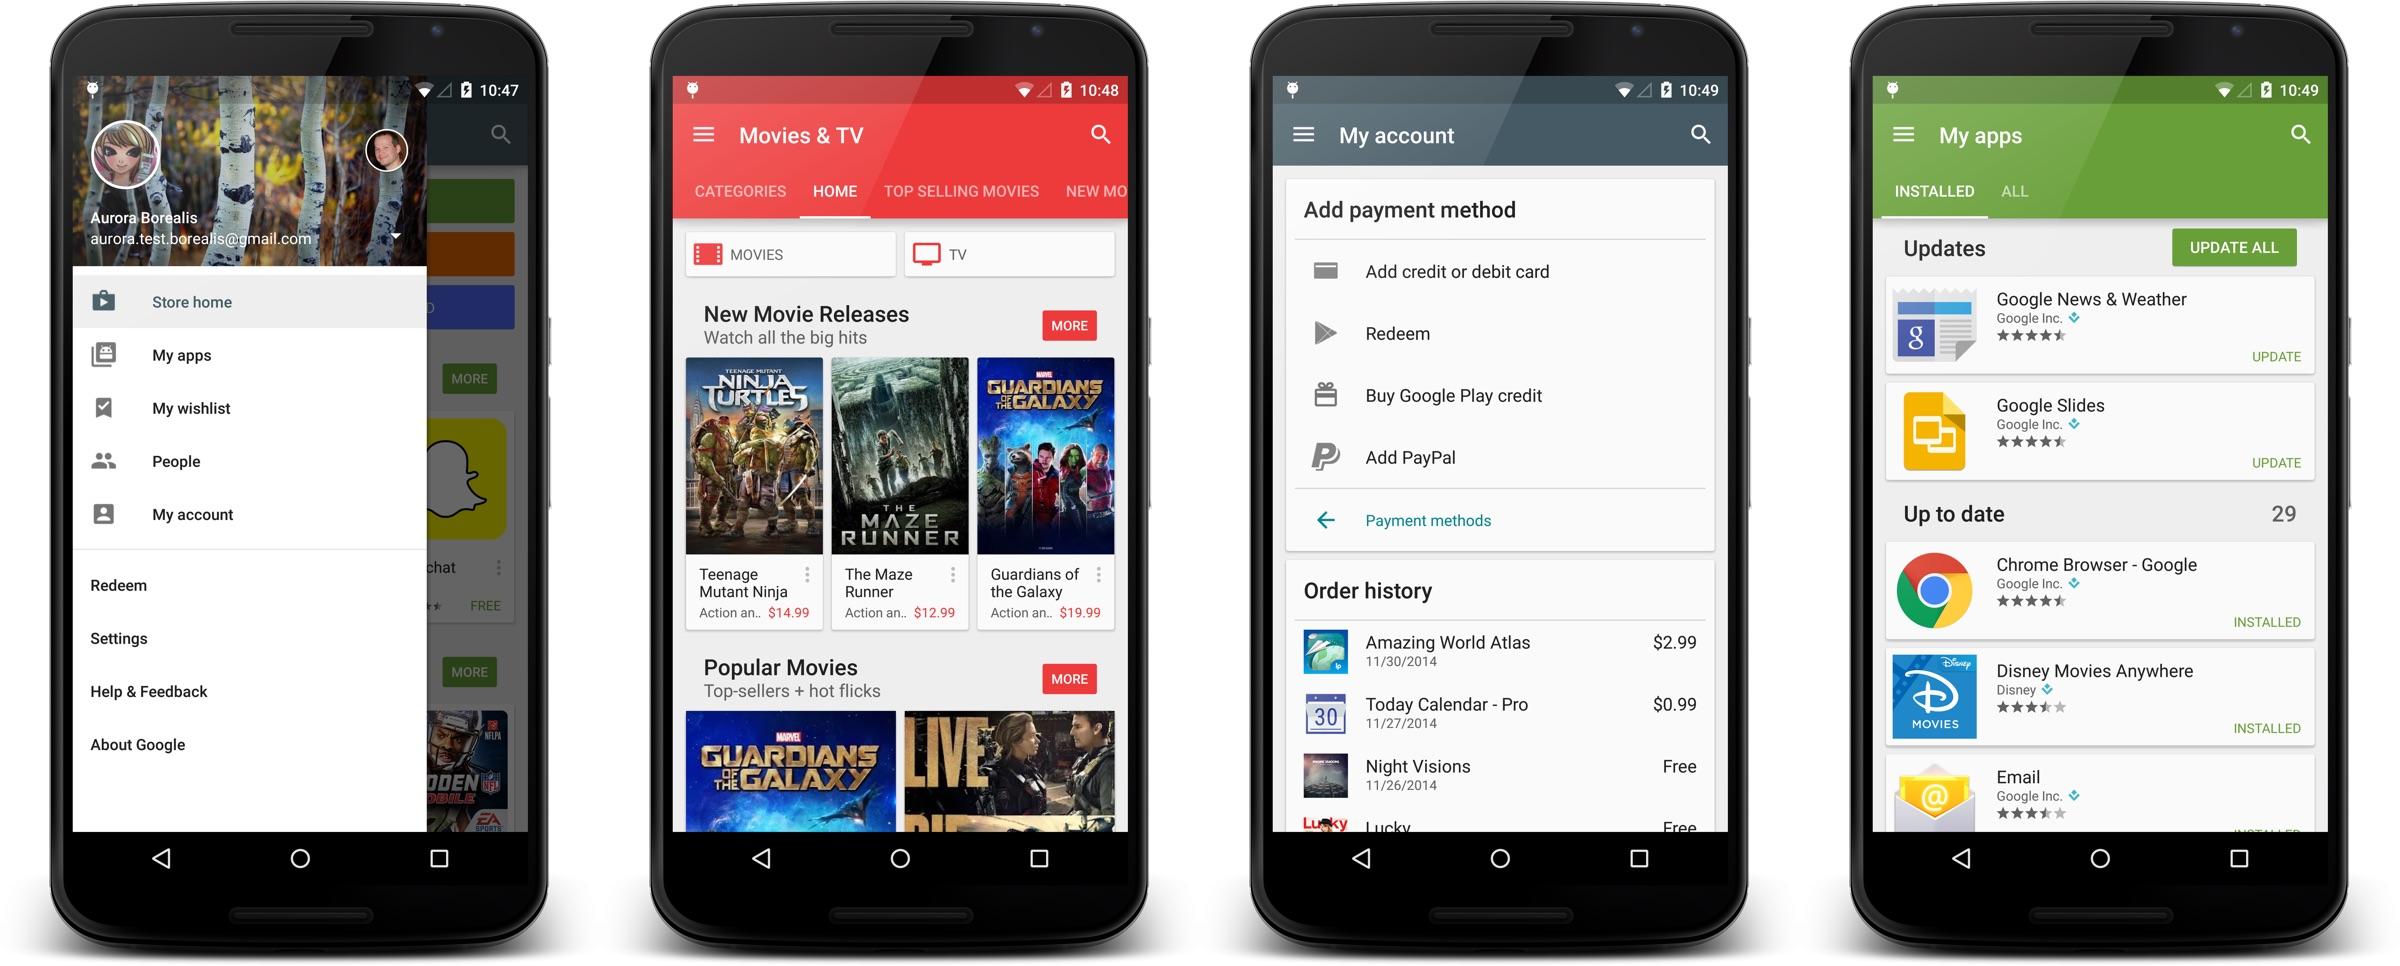 Google-Play-Store-my account interfata